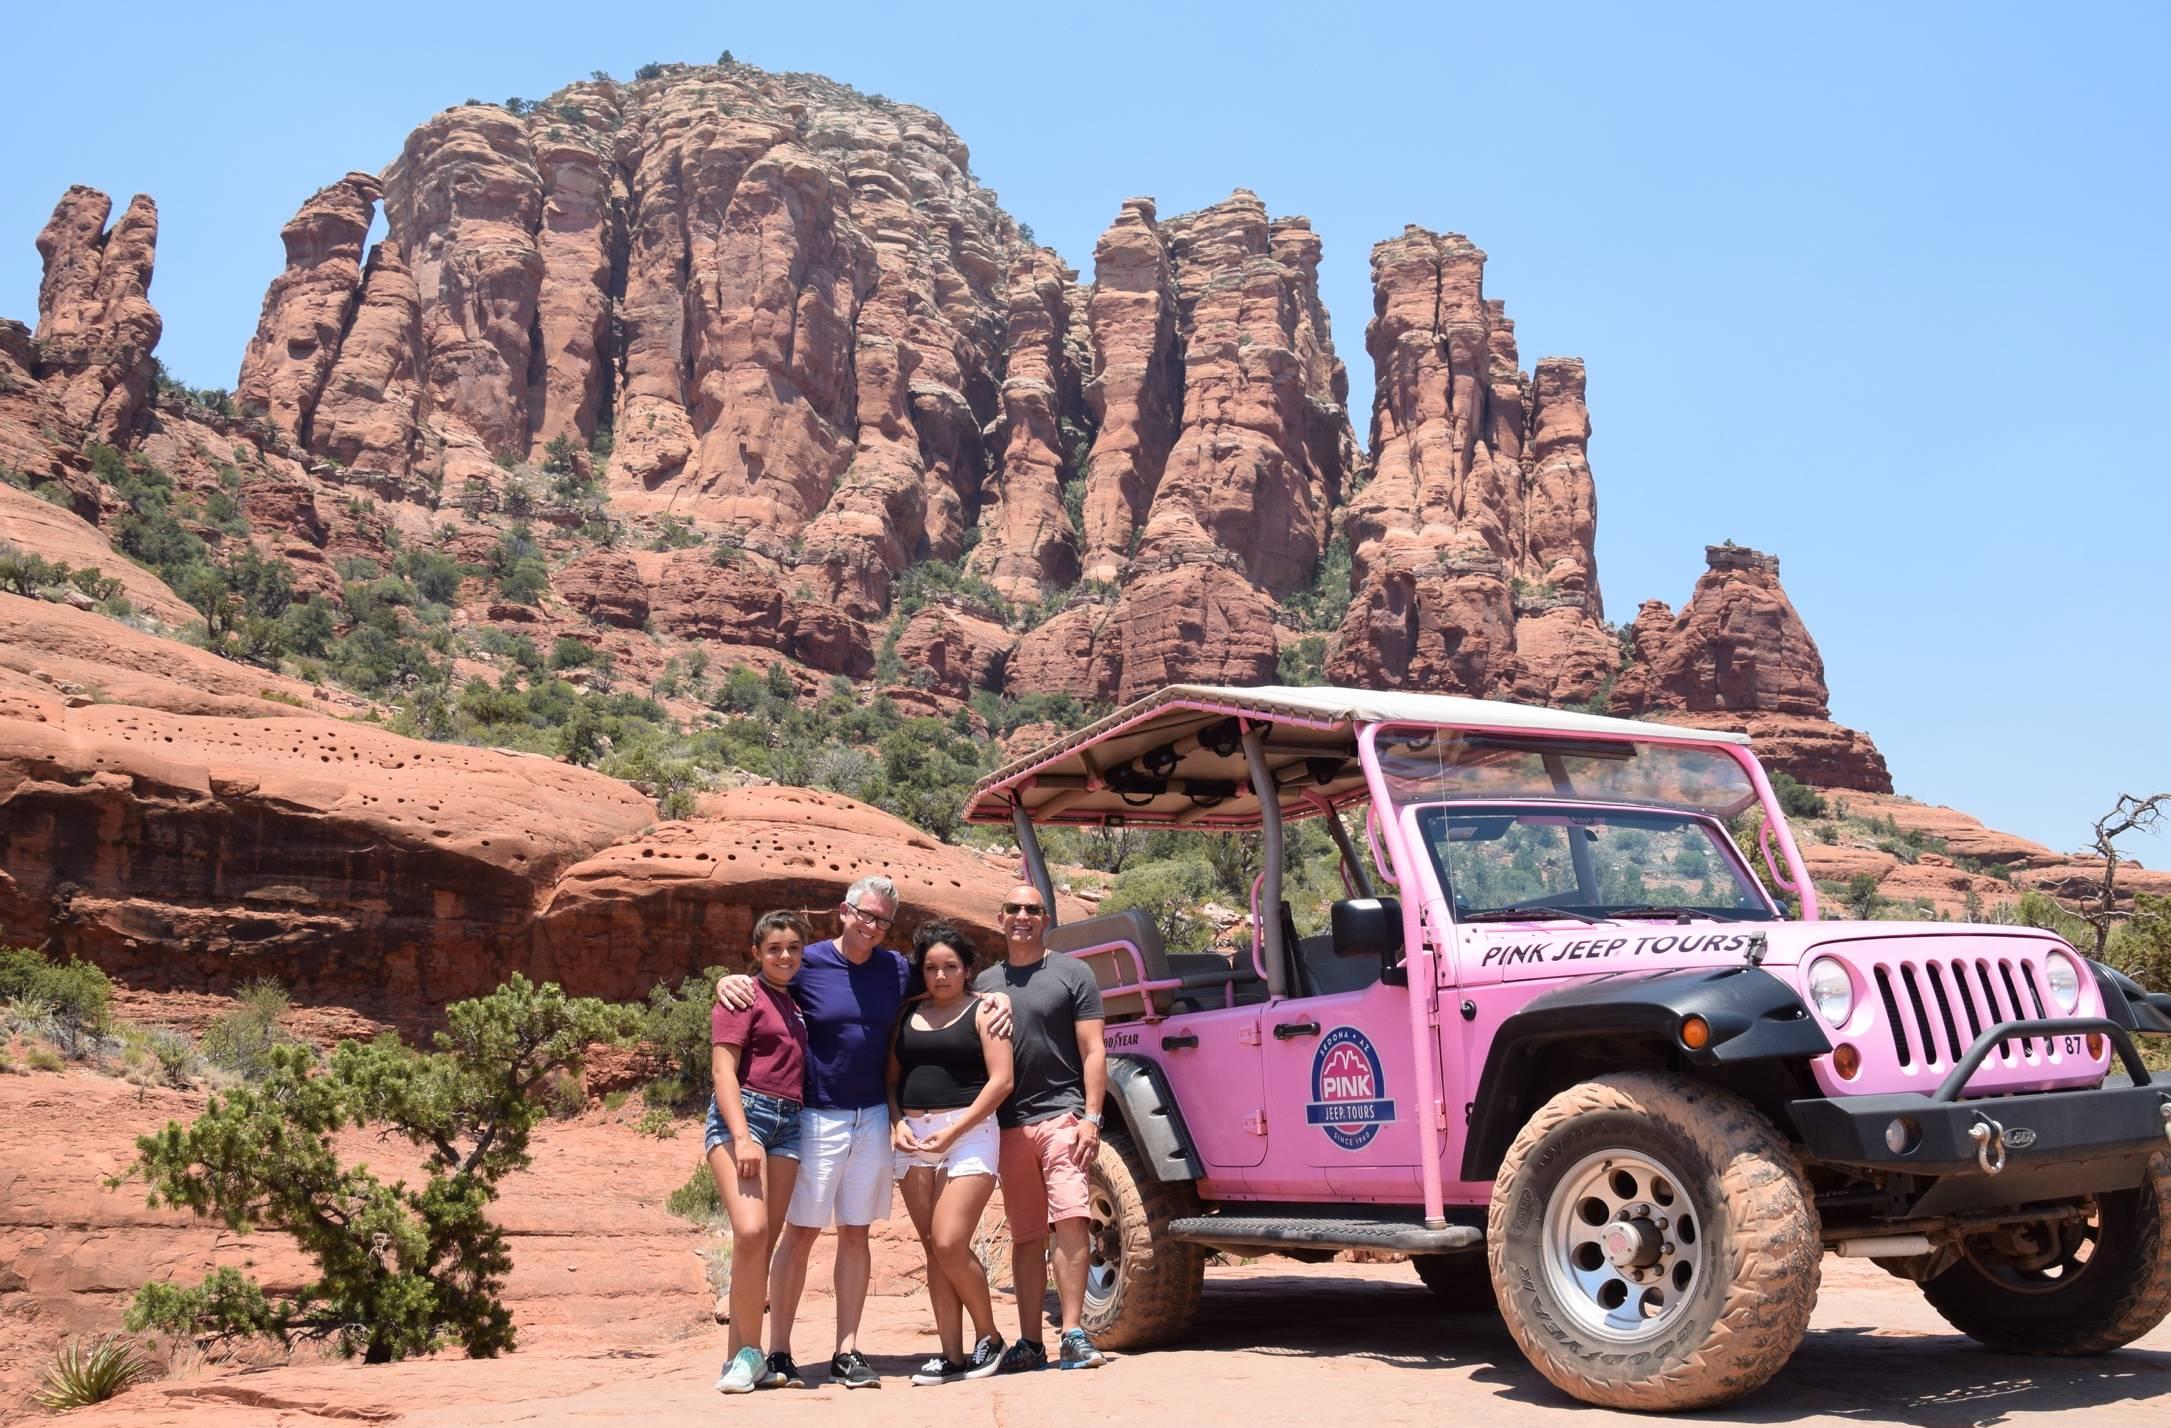 Pink Jeep Tours Sedona Arizona